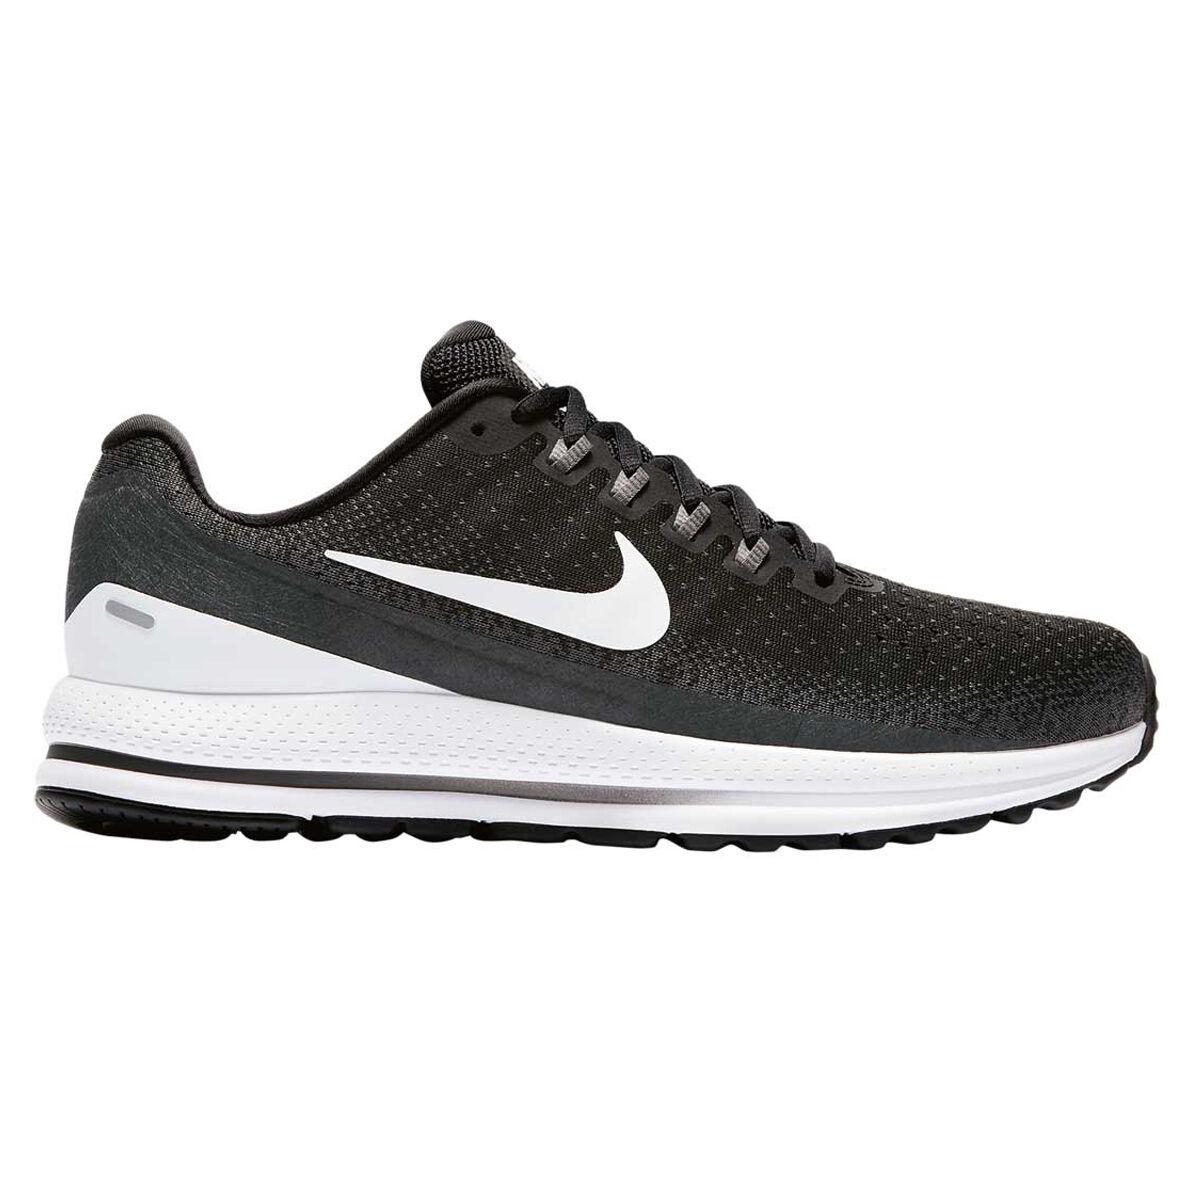 336b73c4caa9 coupon nike air zoom vomero 13 mens running shoes black white us 8 black  fcf44 aeb13